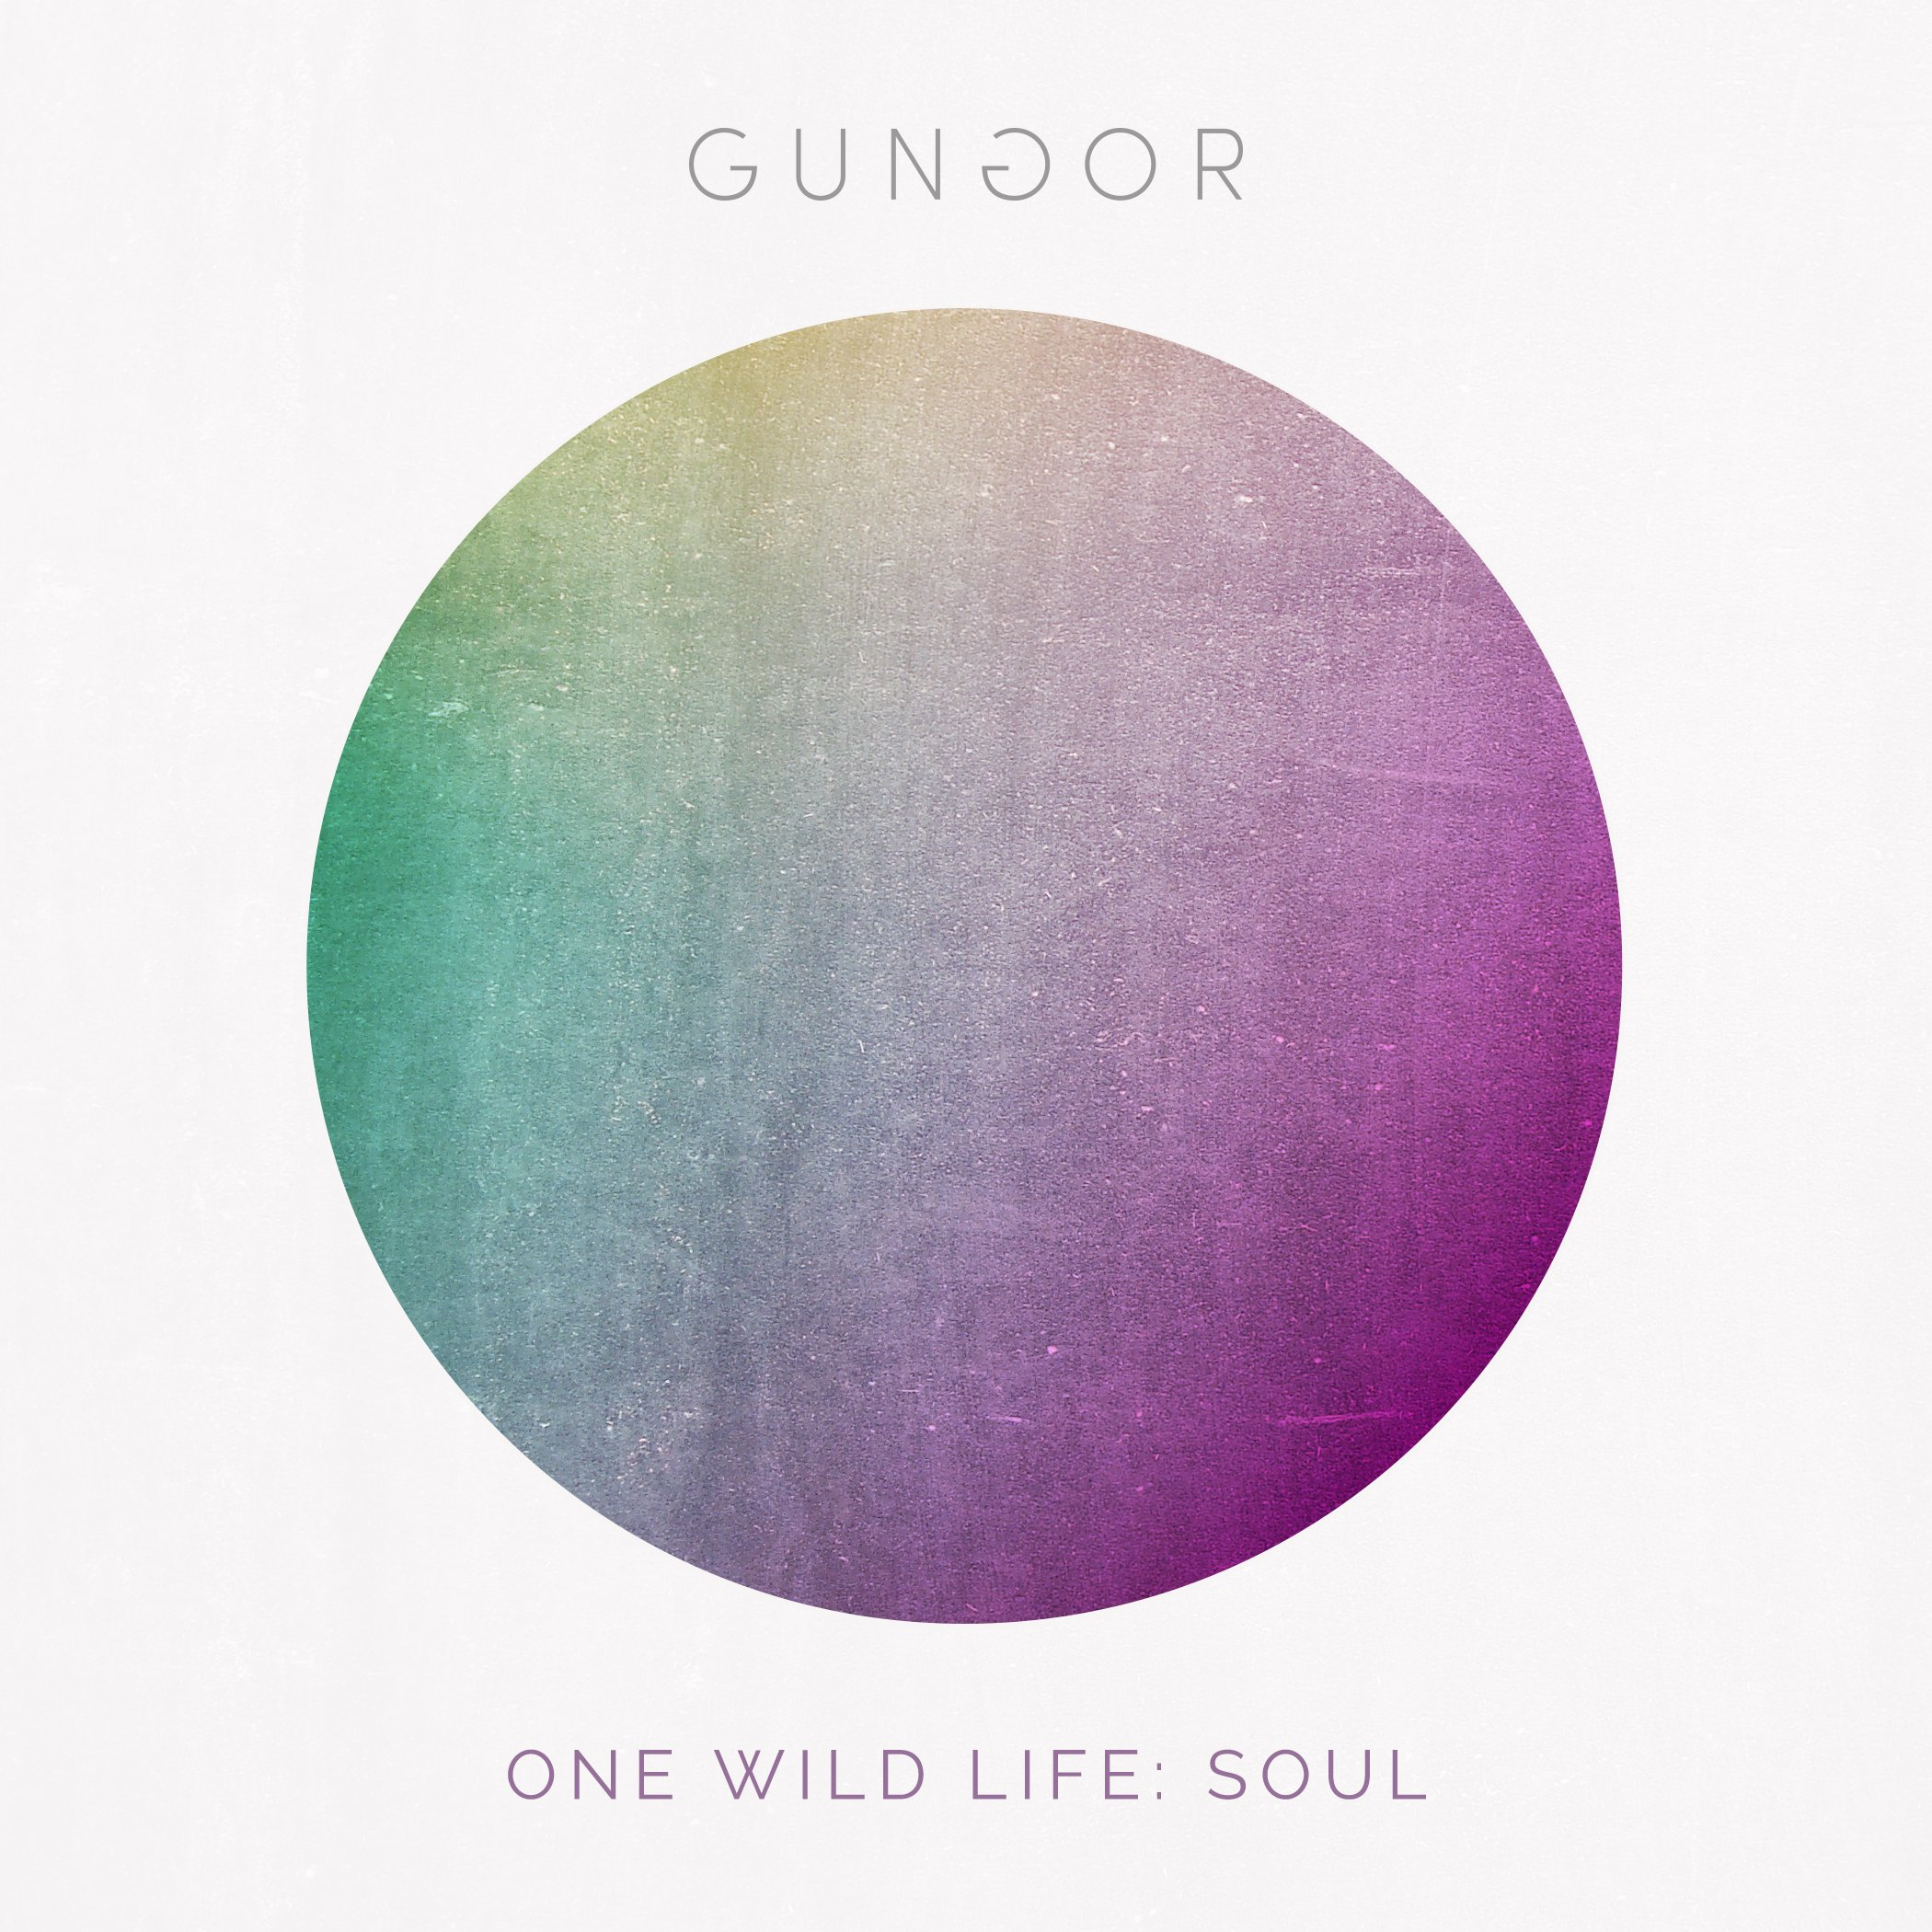 One Wild Life - Soul